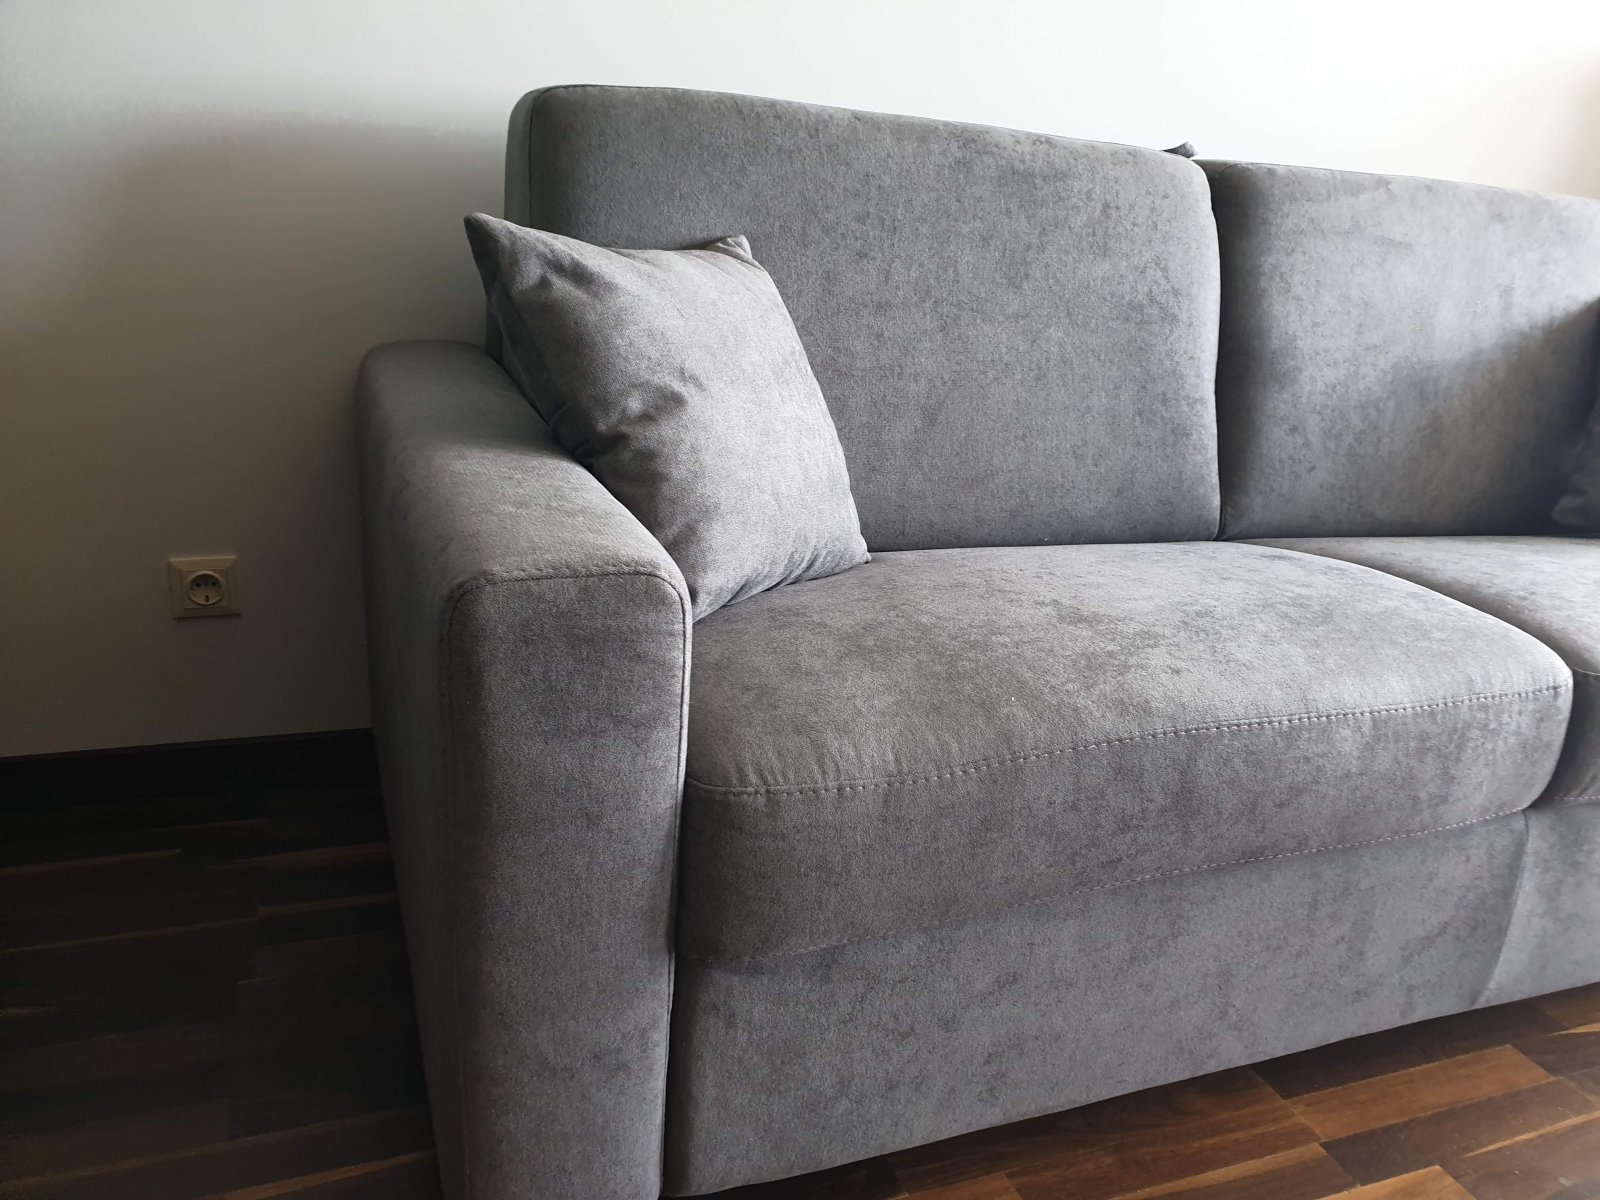 cubo-sofa-lova-reflex.jpg